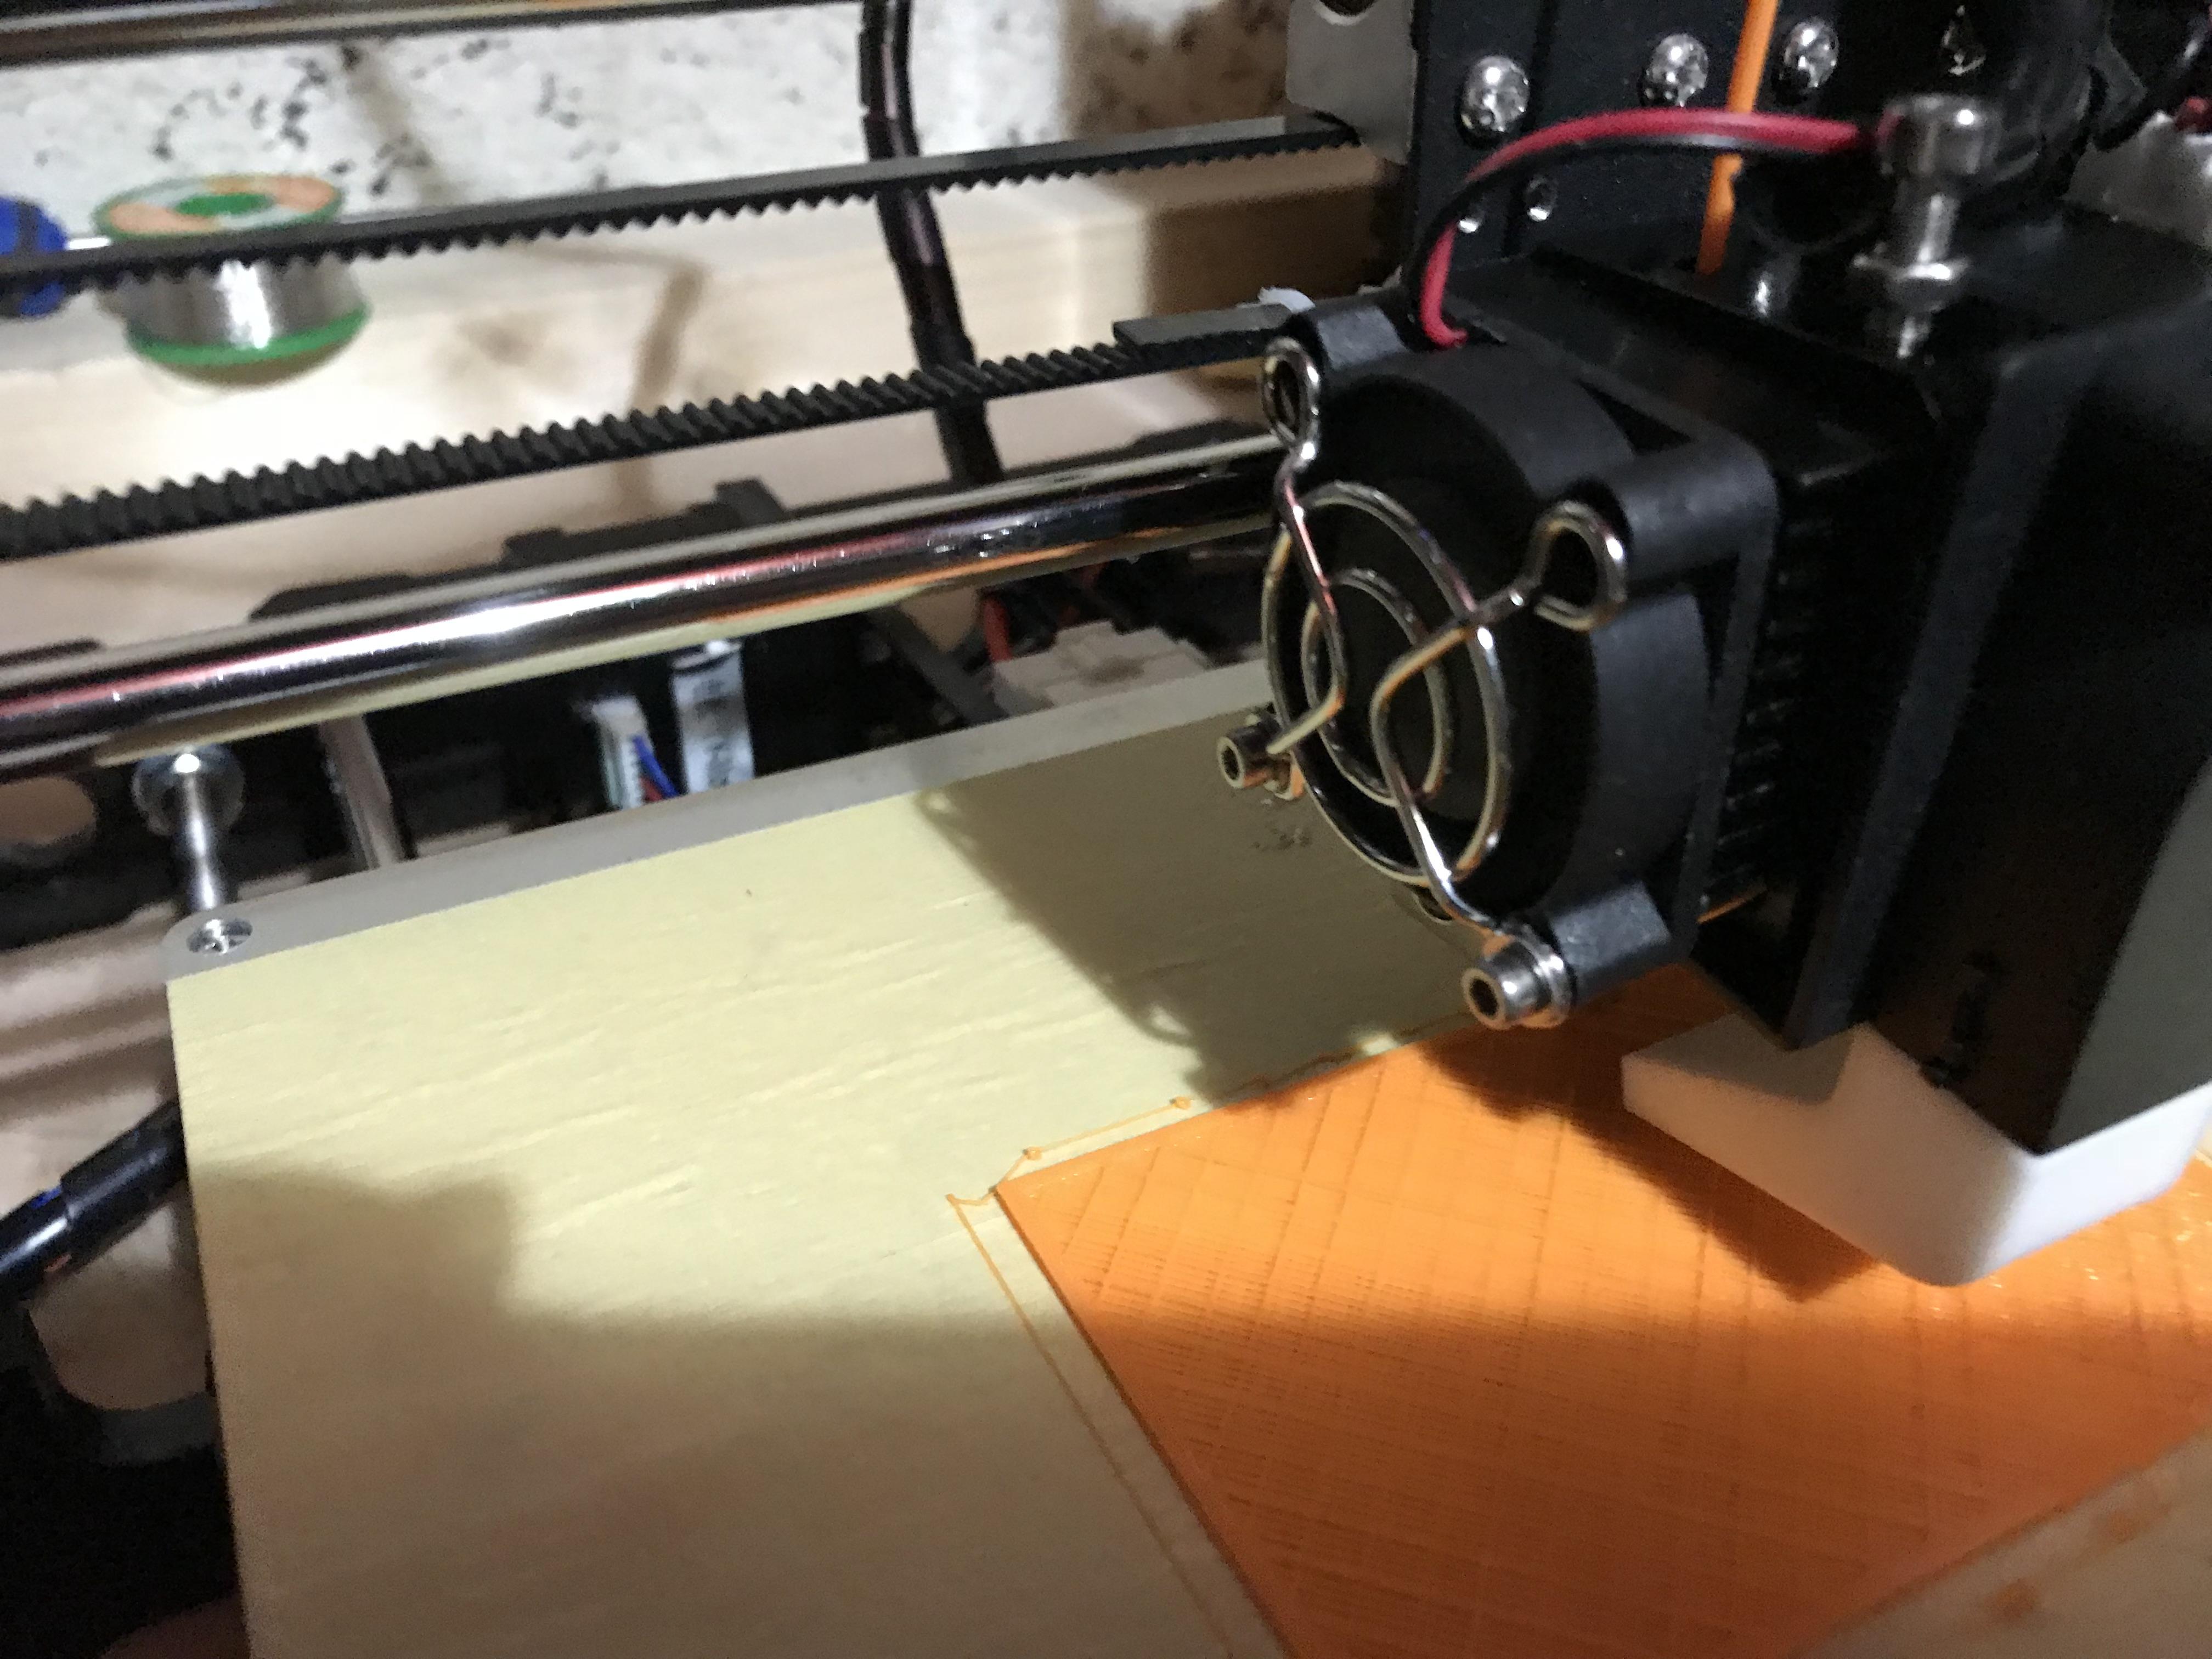 ANET A8 – 3D Printer Build